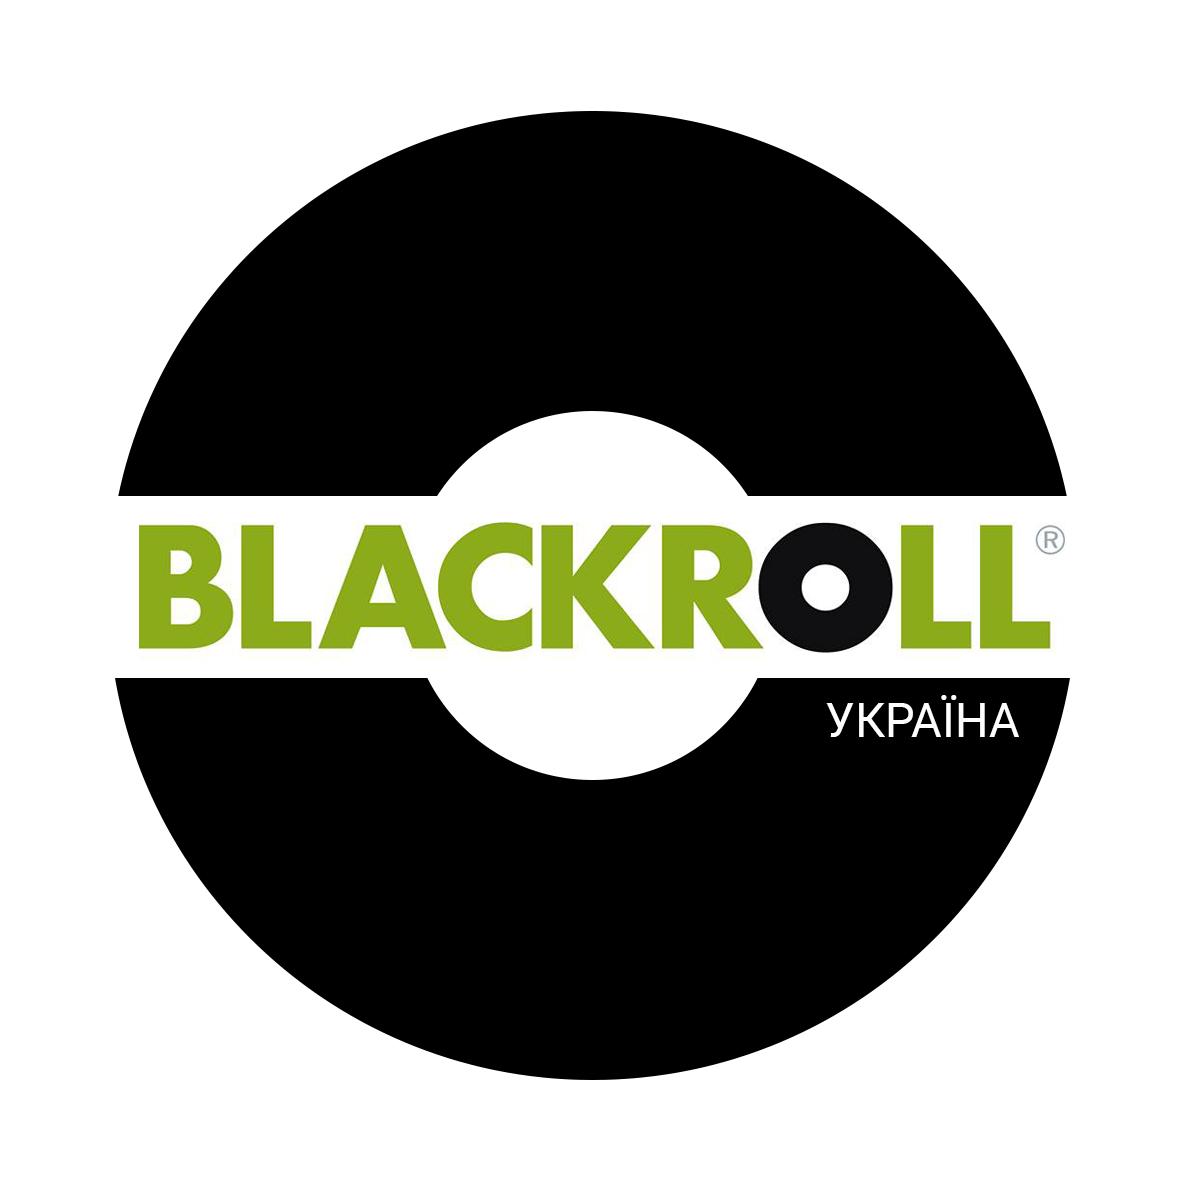 BLACKROLL® Украина